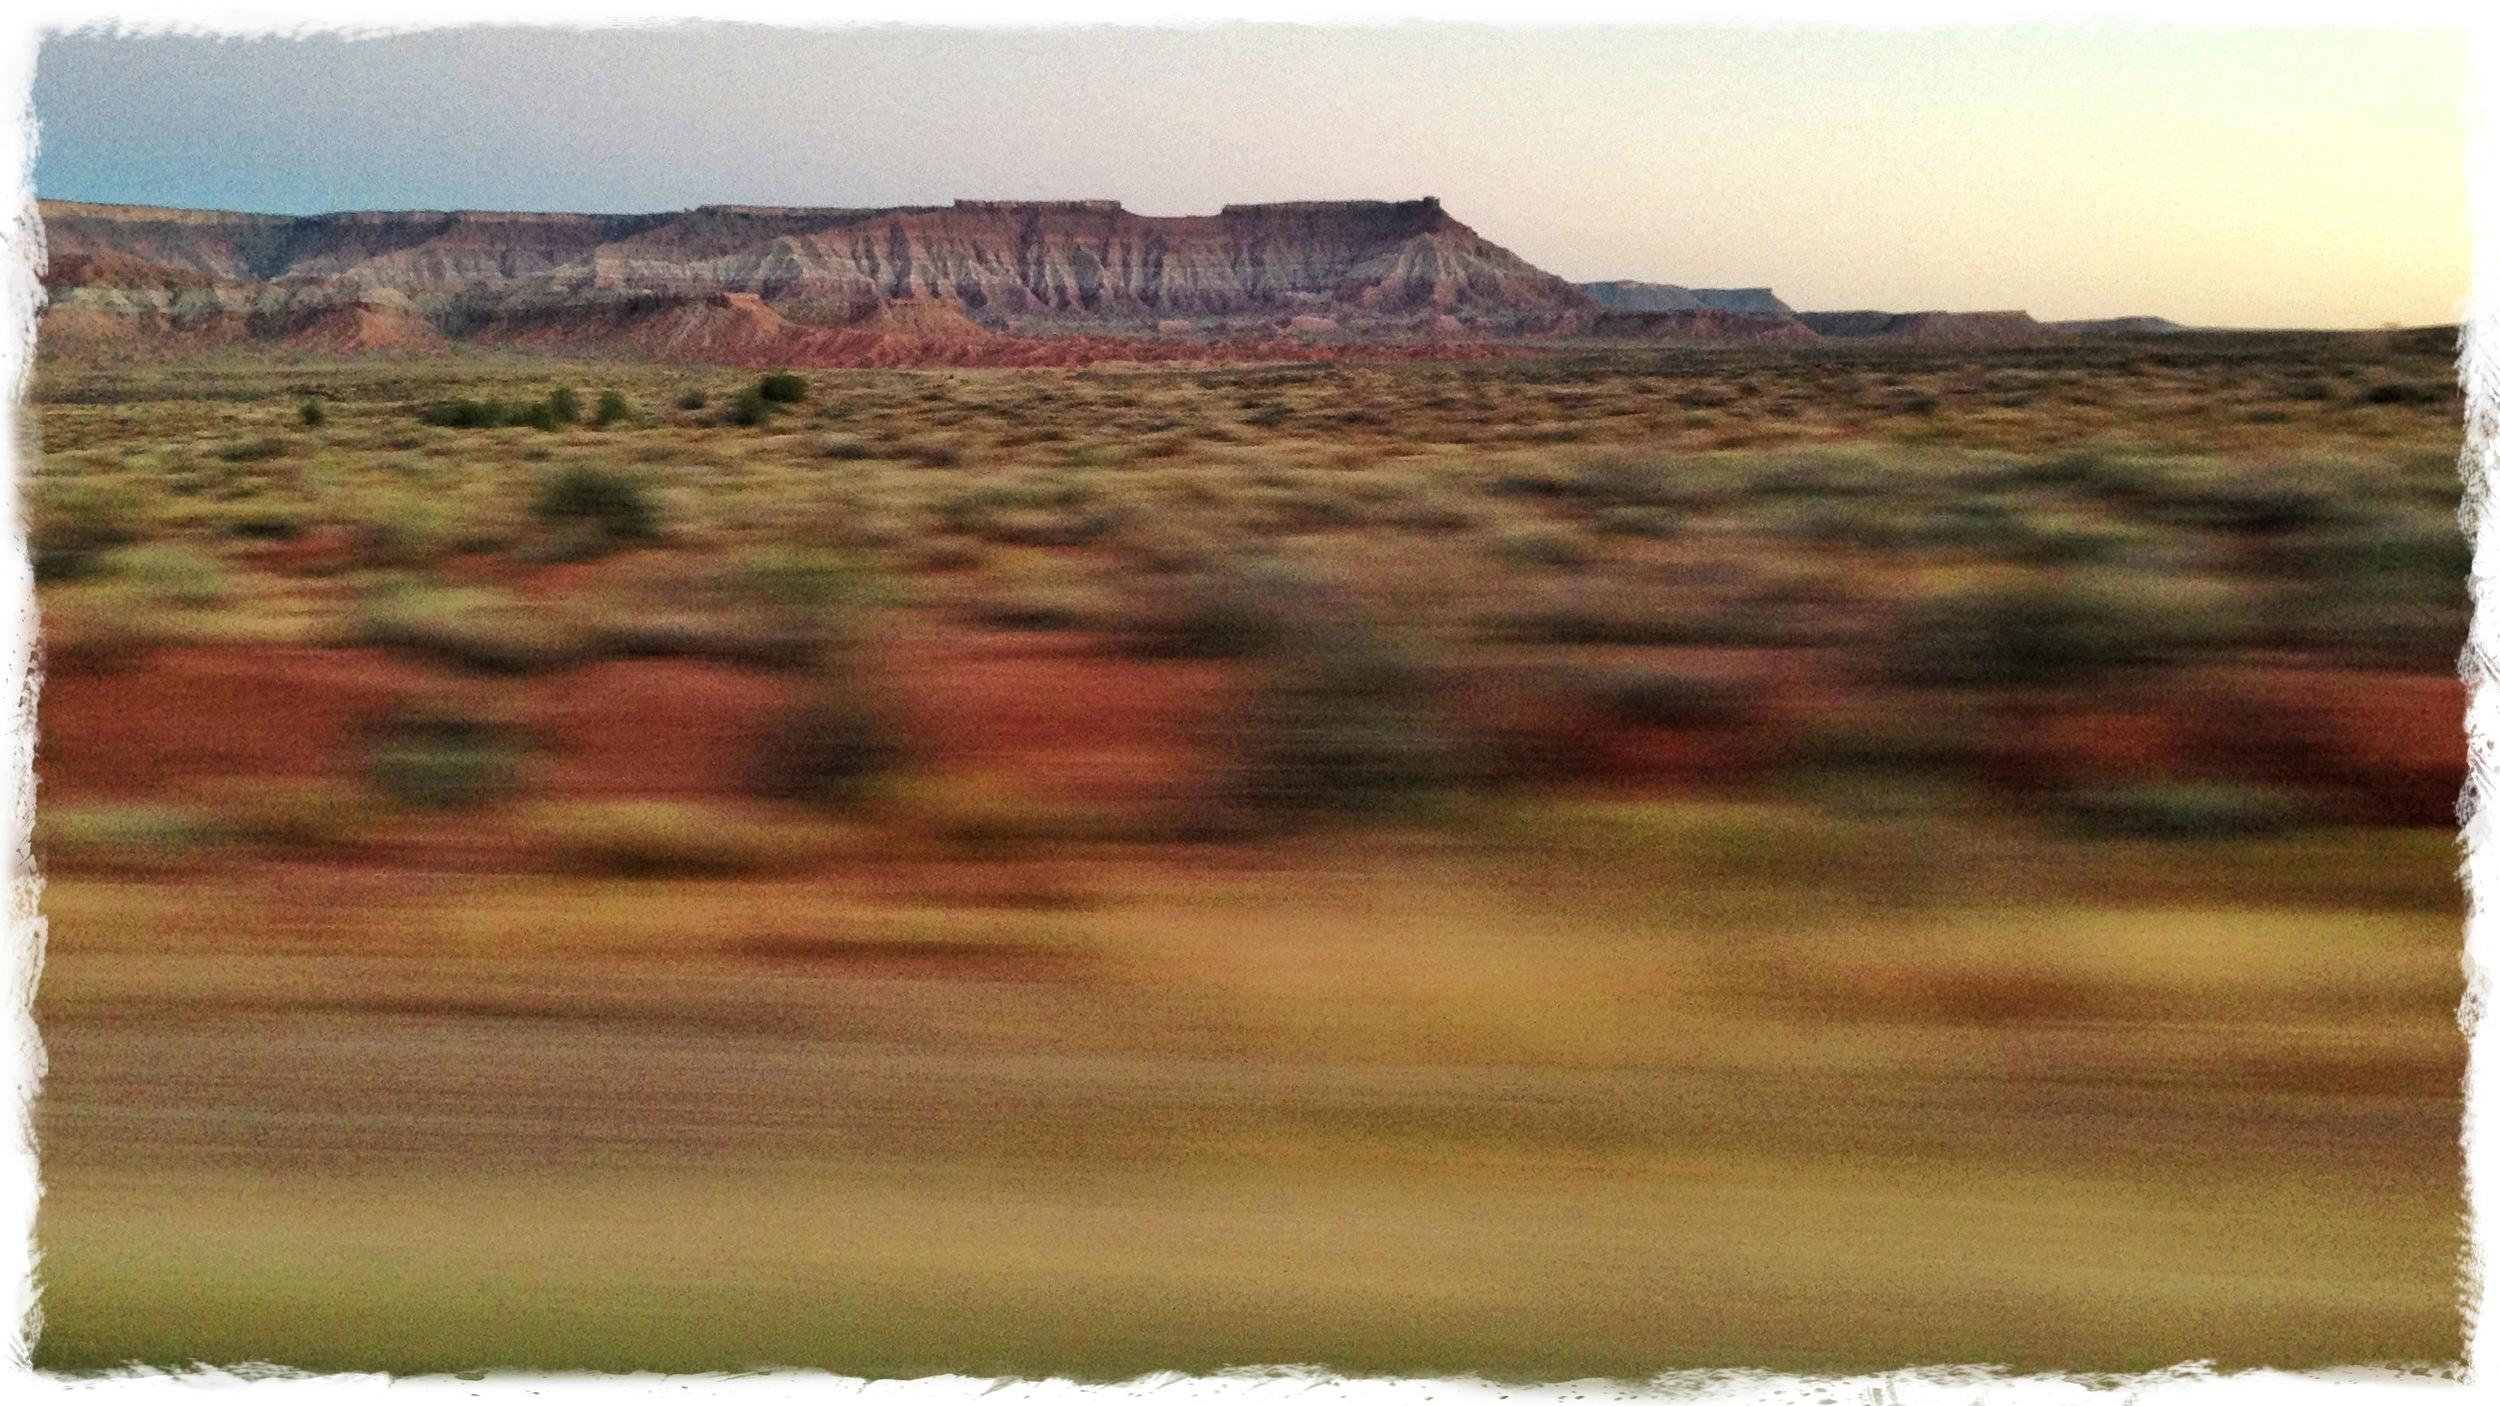 Zion National Park, Utah. Road Trip. Wasim Muklashy Photography